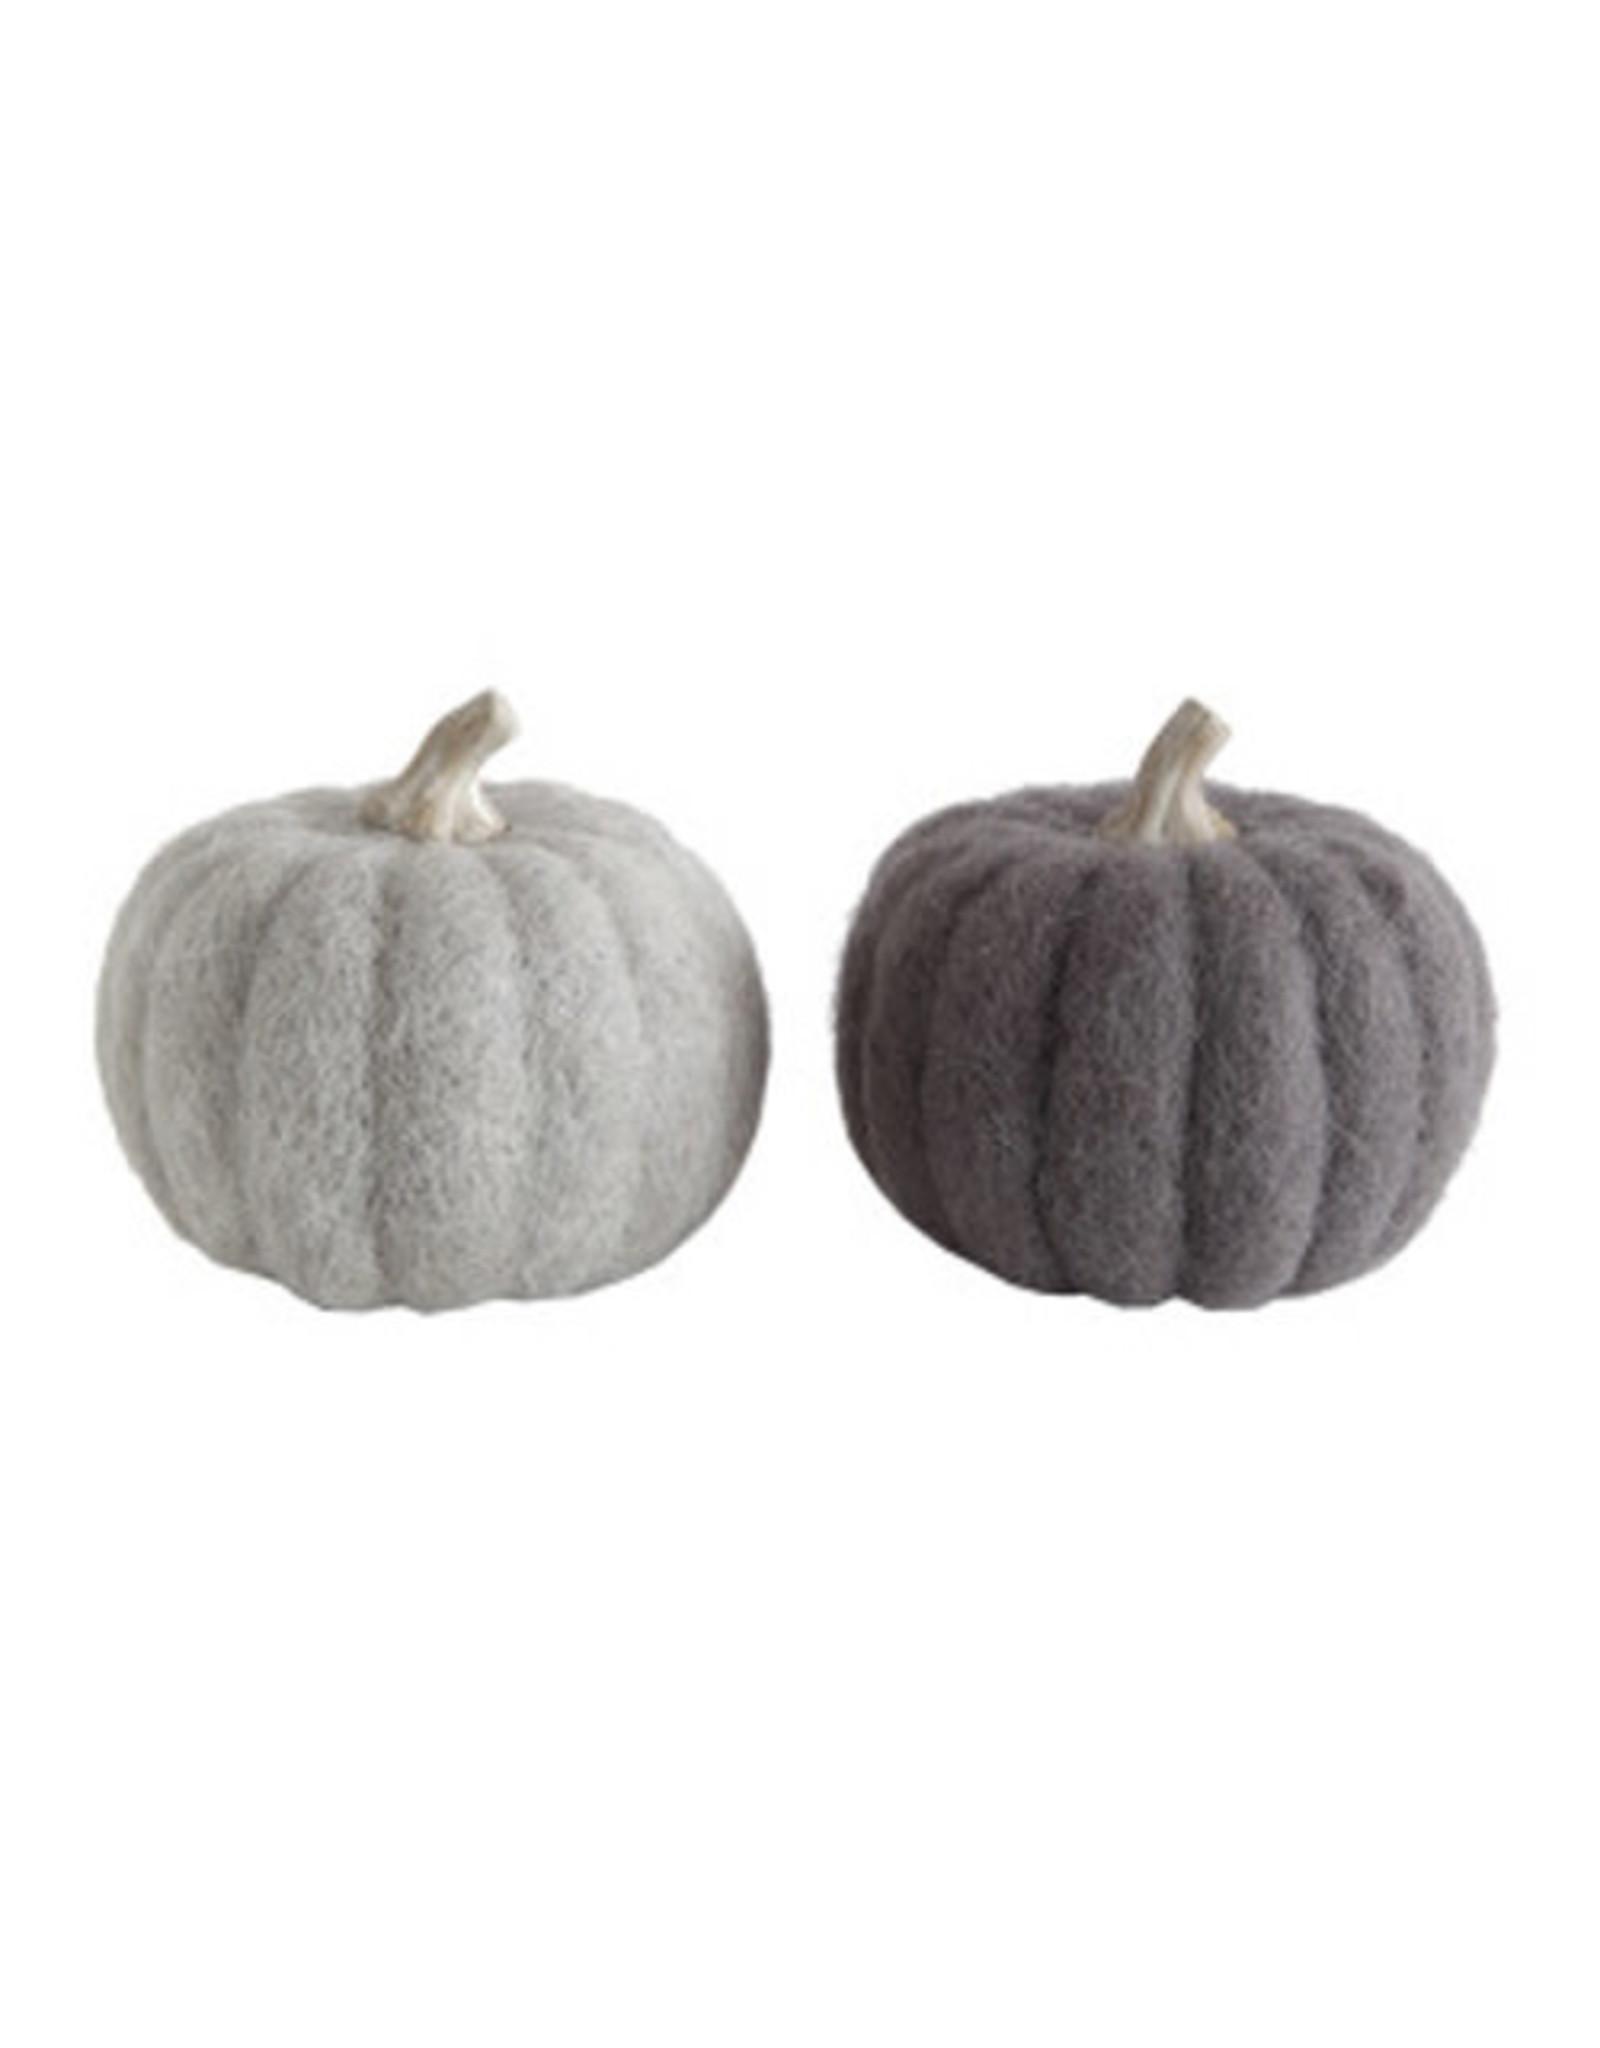 "4 1/4""H Wool Felt Pumpkin with Resin Stem"